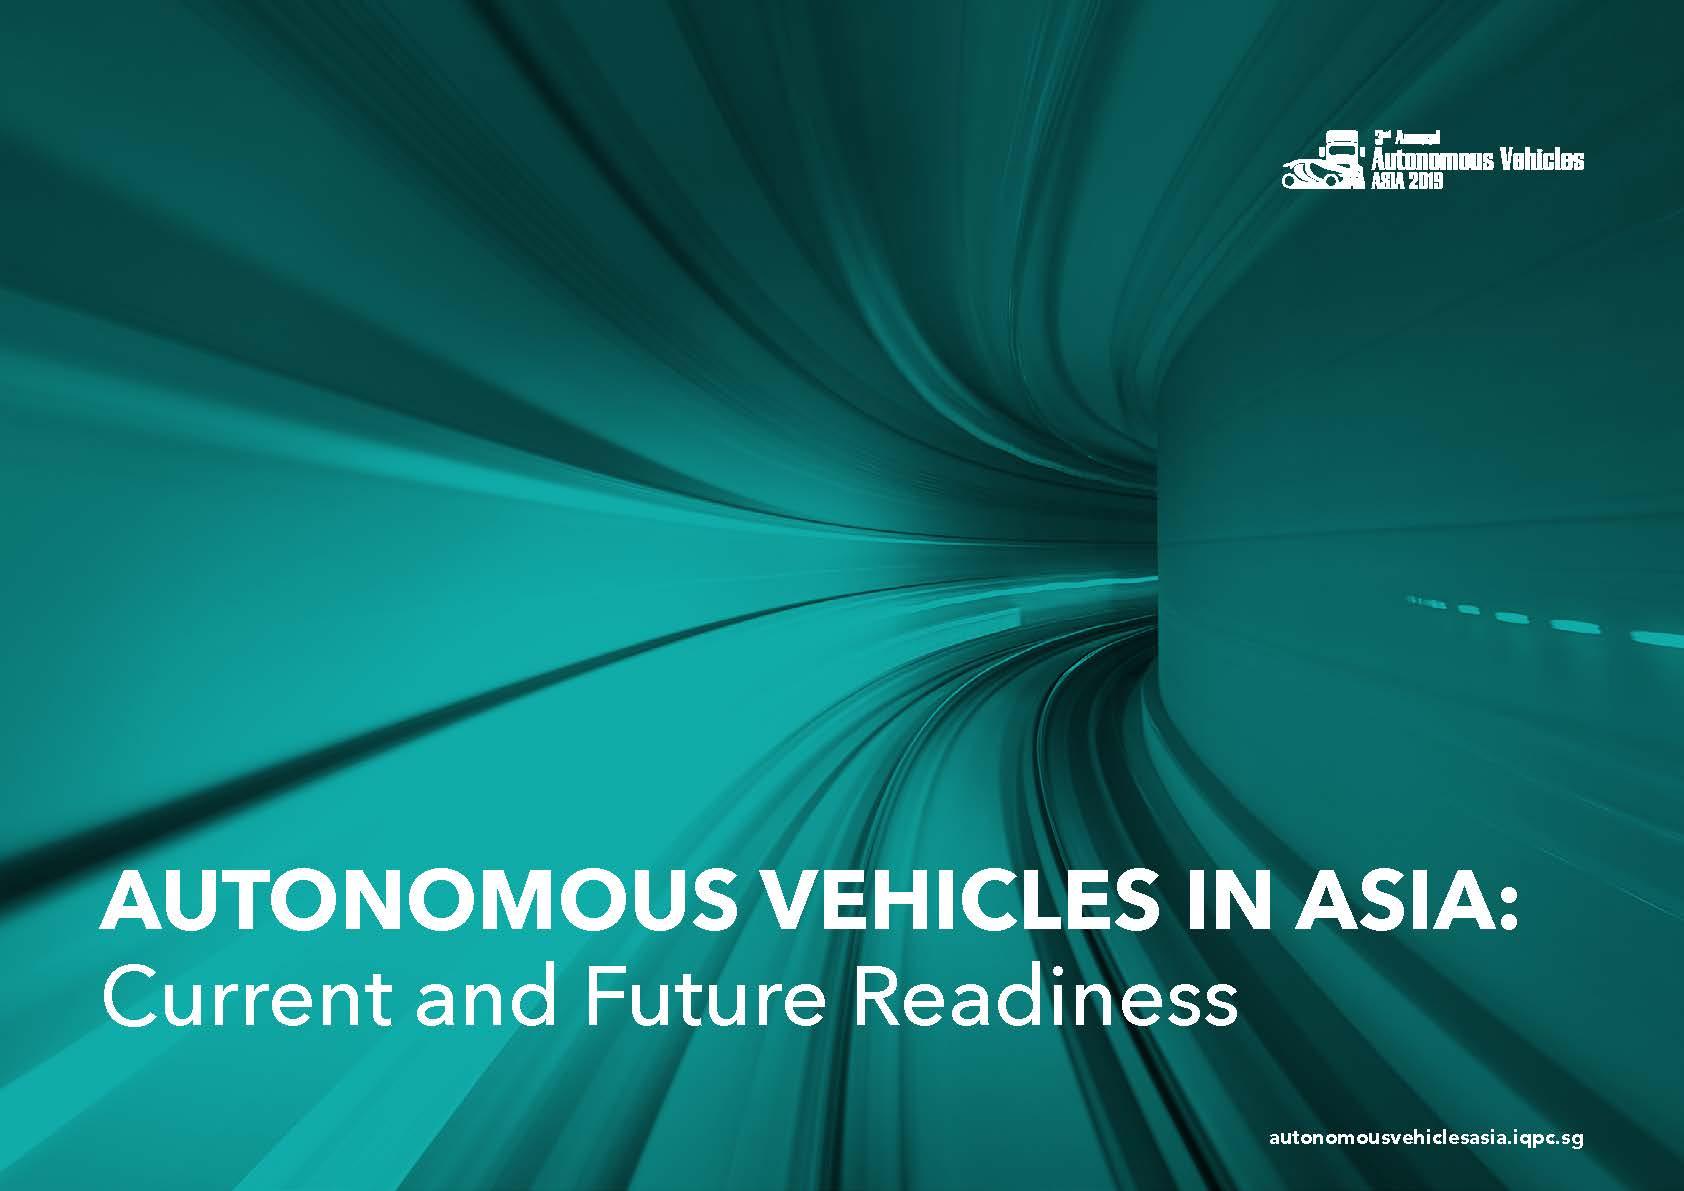 AUTONOMOUS VEHICLES IN ASIA: Current and Future Readiness spex